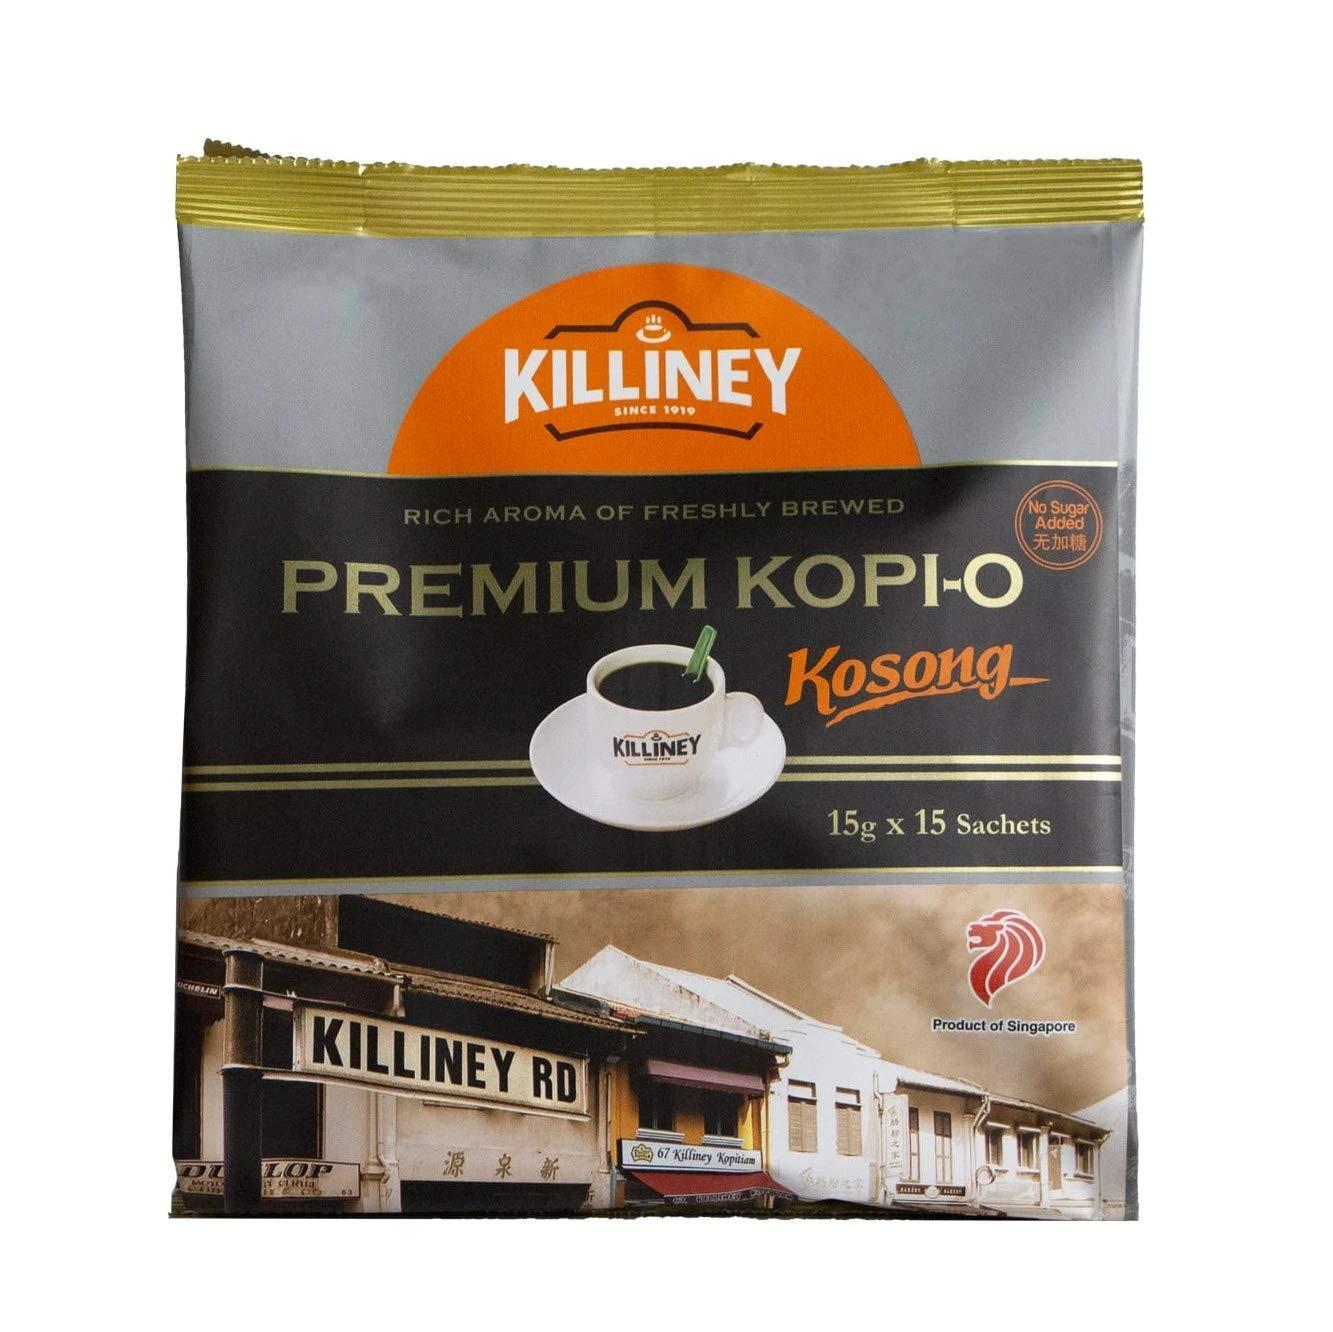 Elegant Killiney Premium Kosong Over item handling Kopi-O